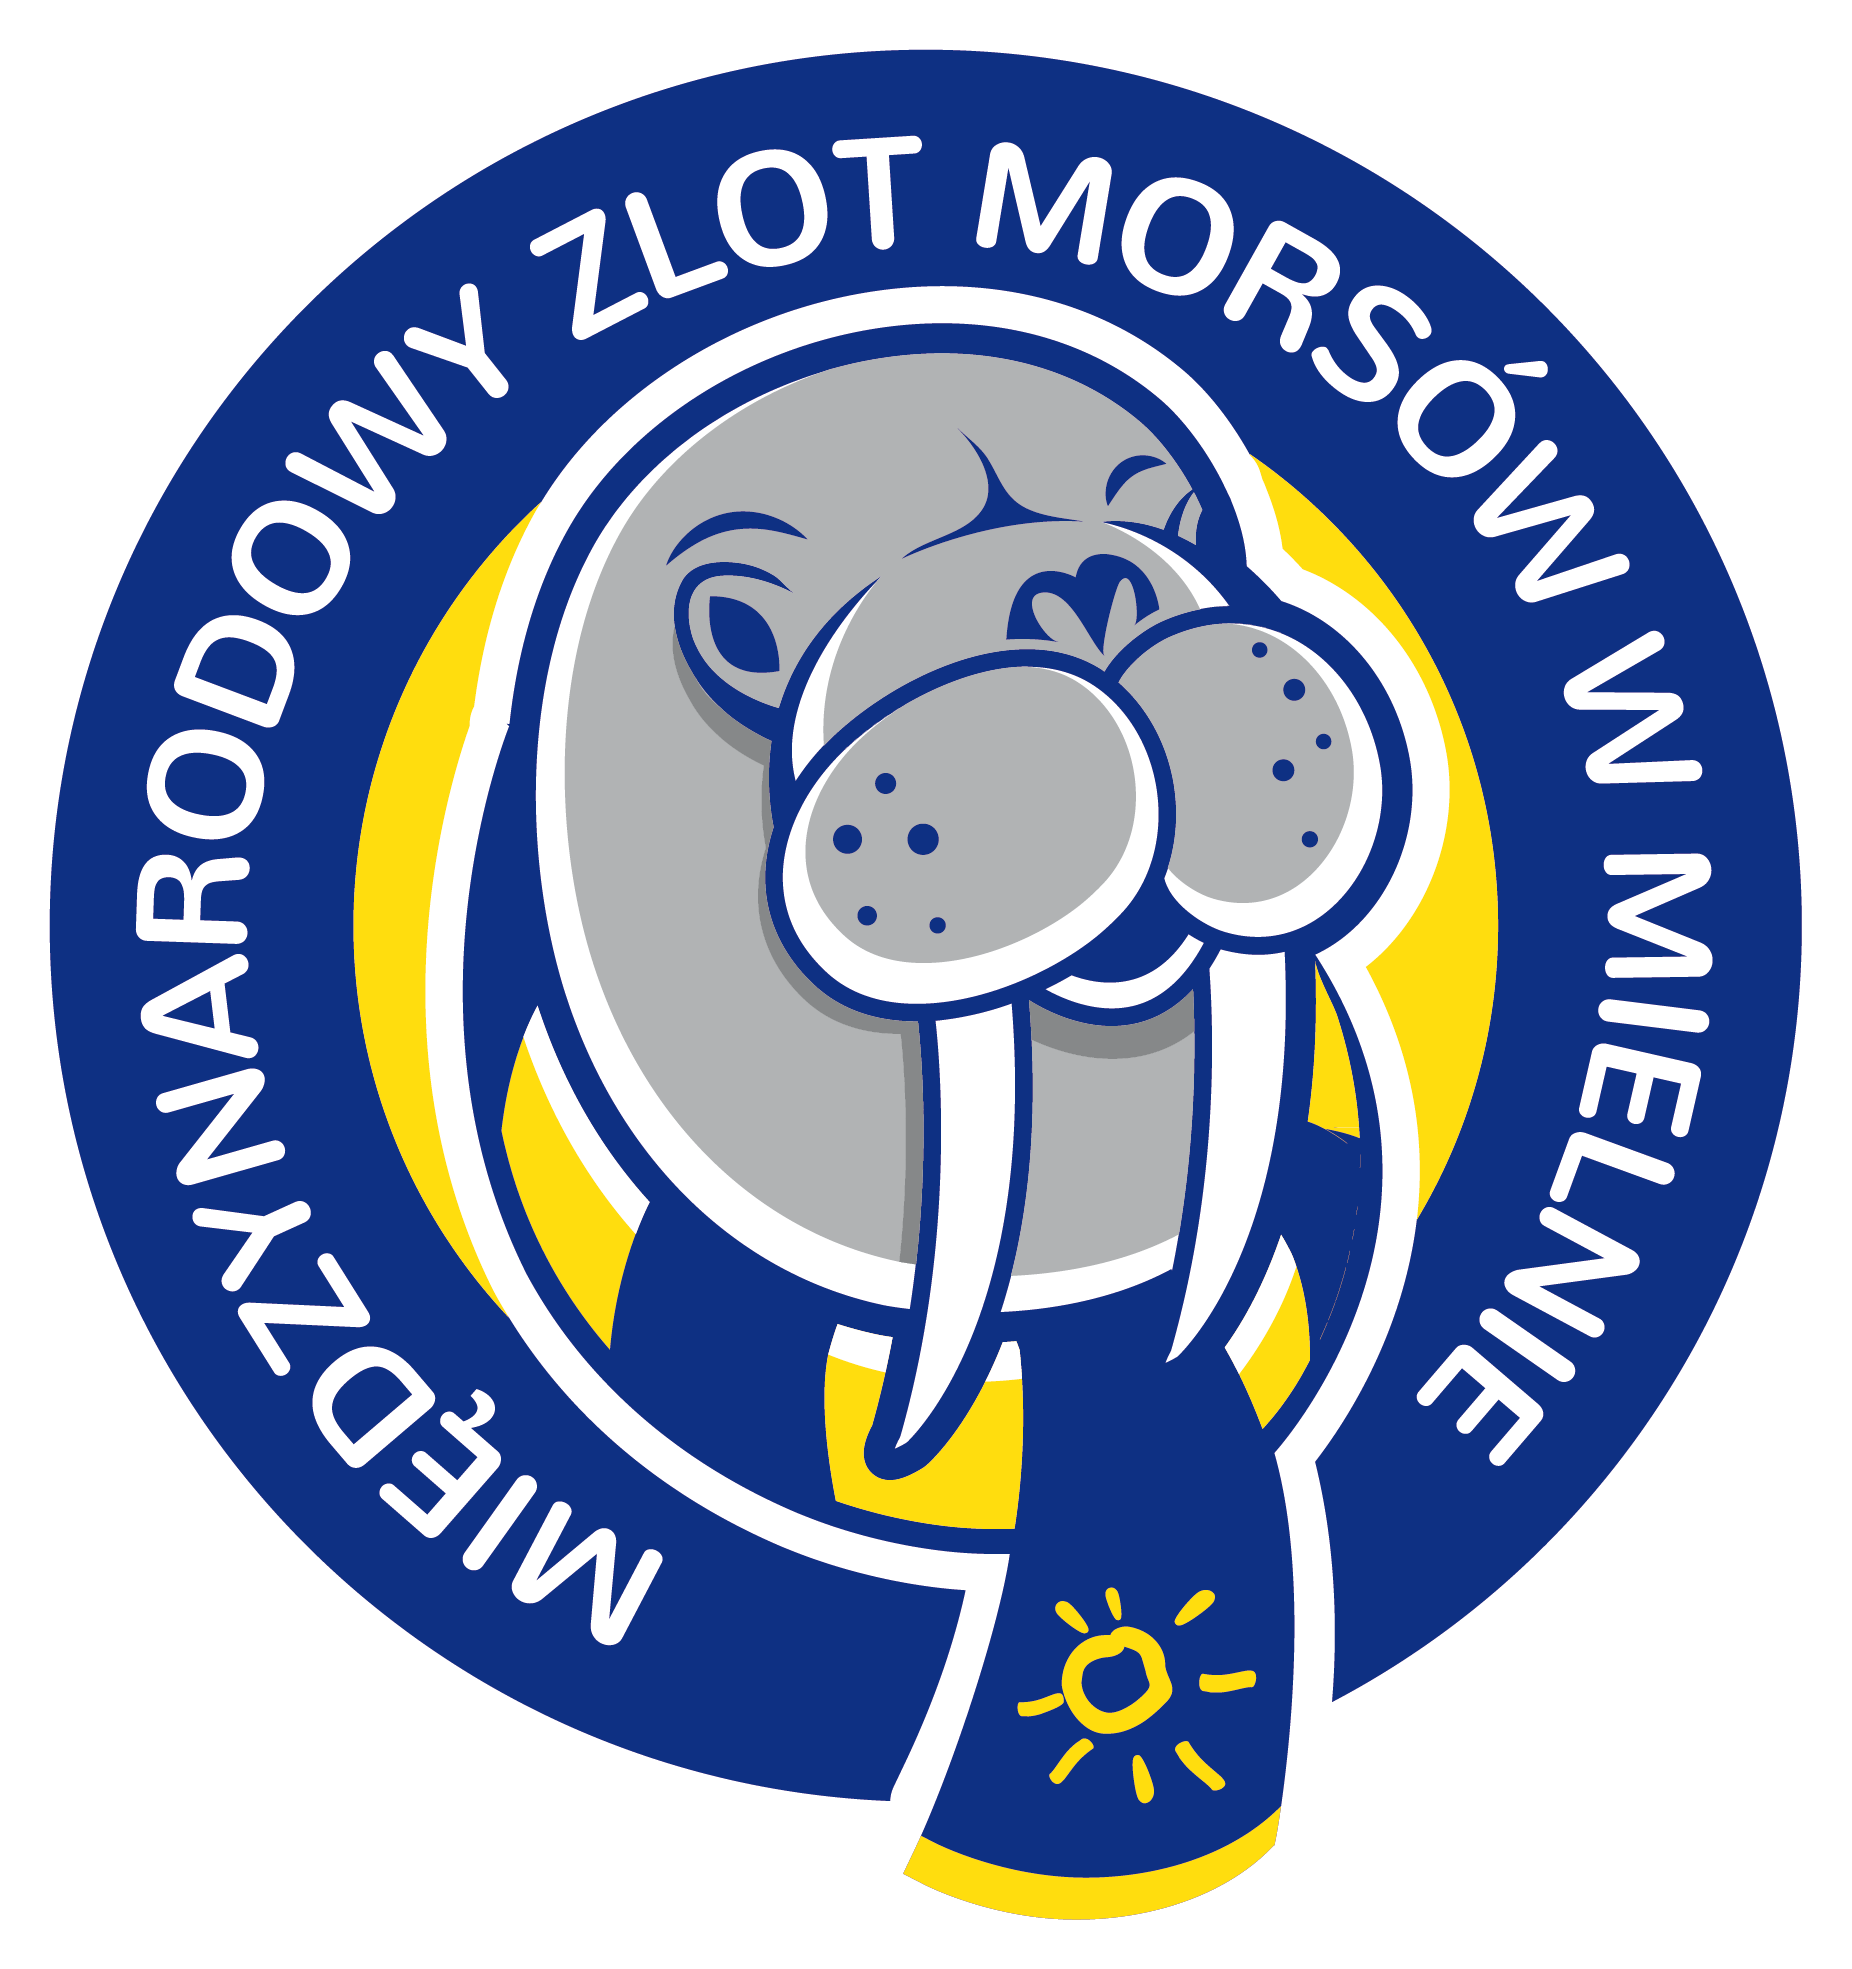 Zlot Morsów _logo